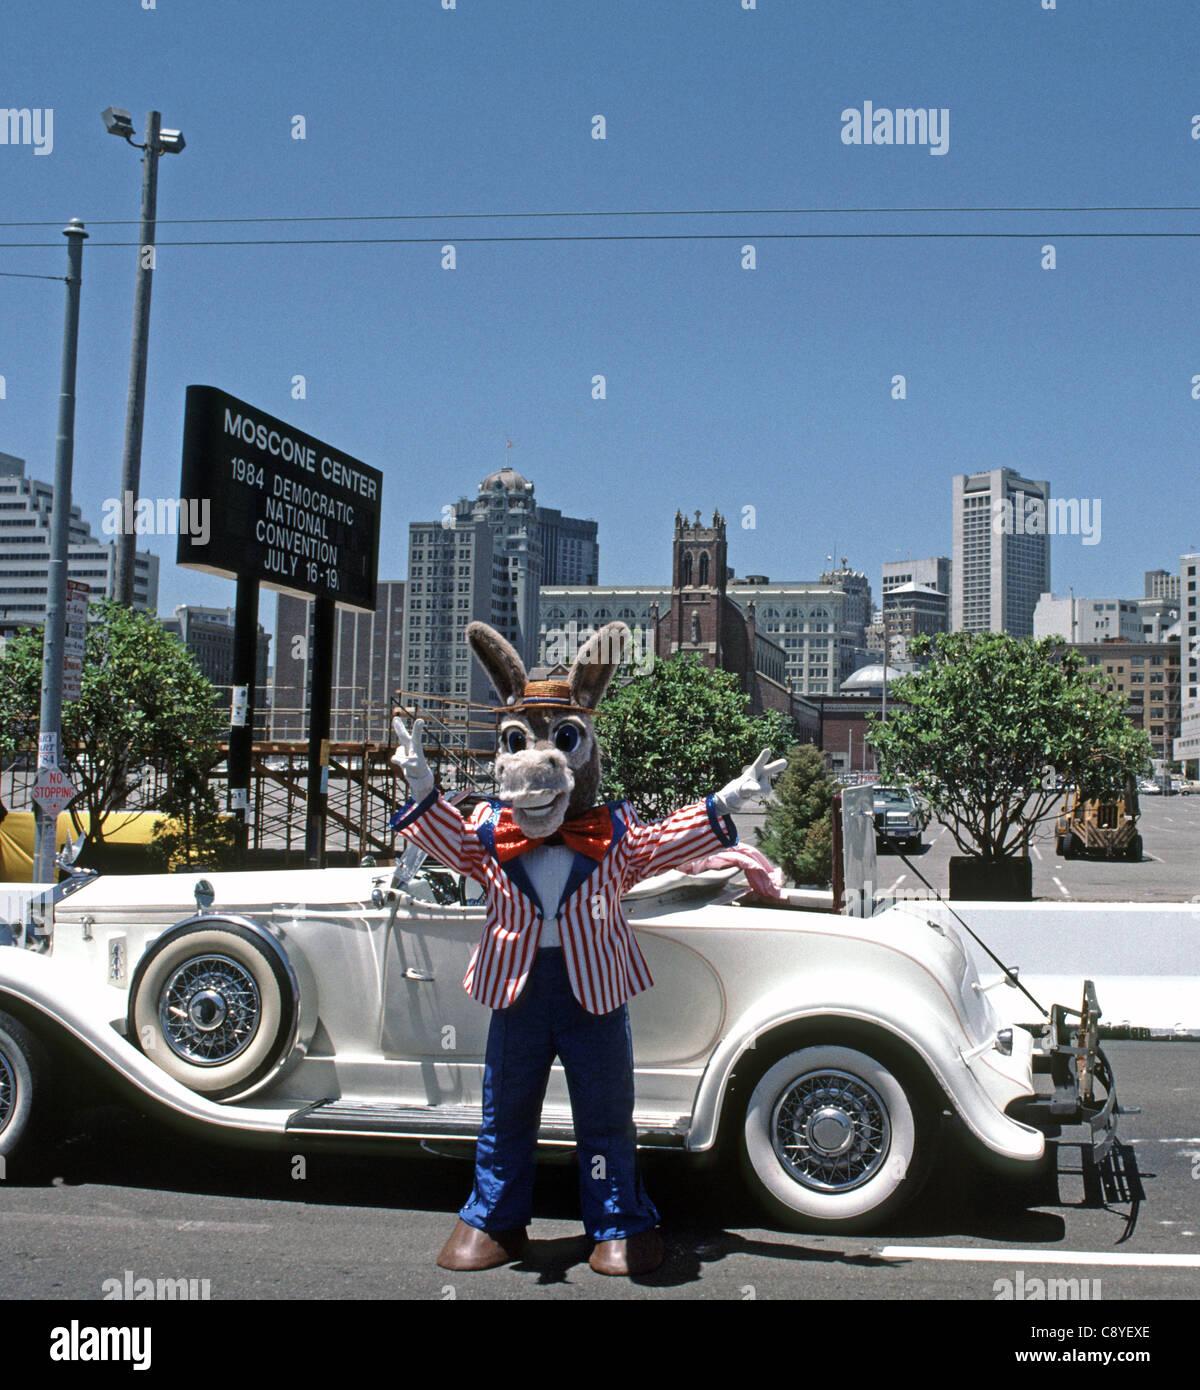 1984 Democratic National Convention, San Francisco, California. USA - Stock Image